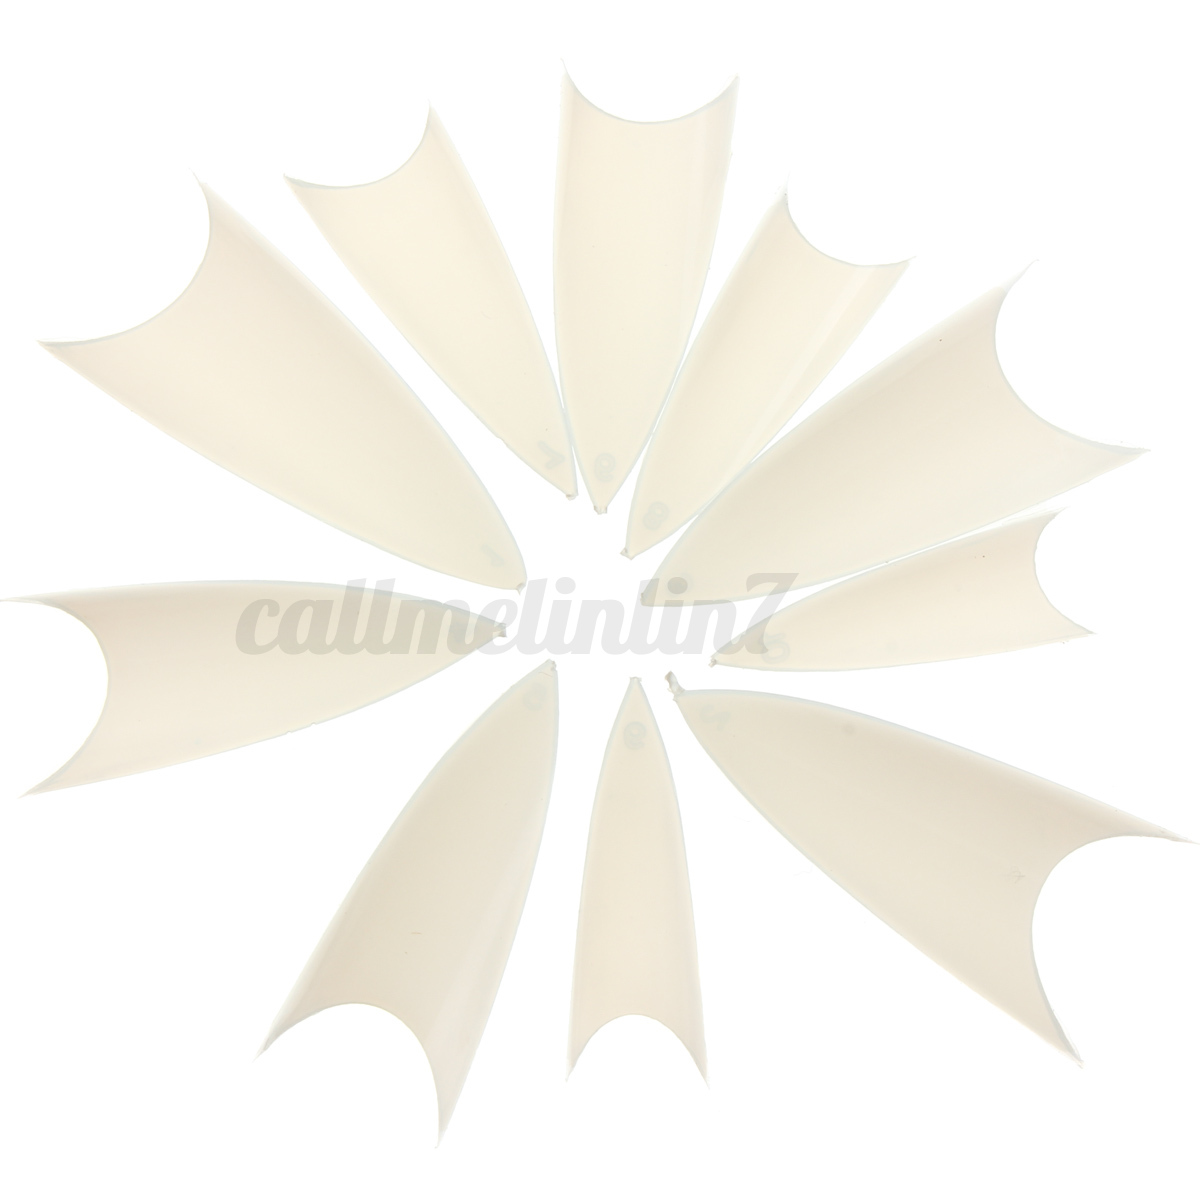 500 Finte Unghie Tips Stiletto Naturale Bianco Nail Art